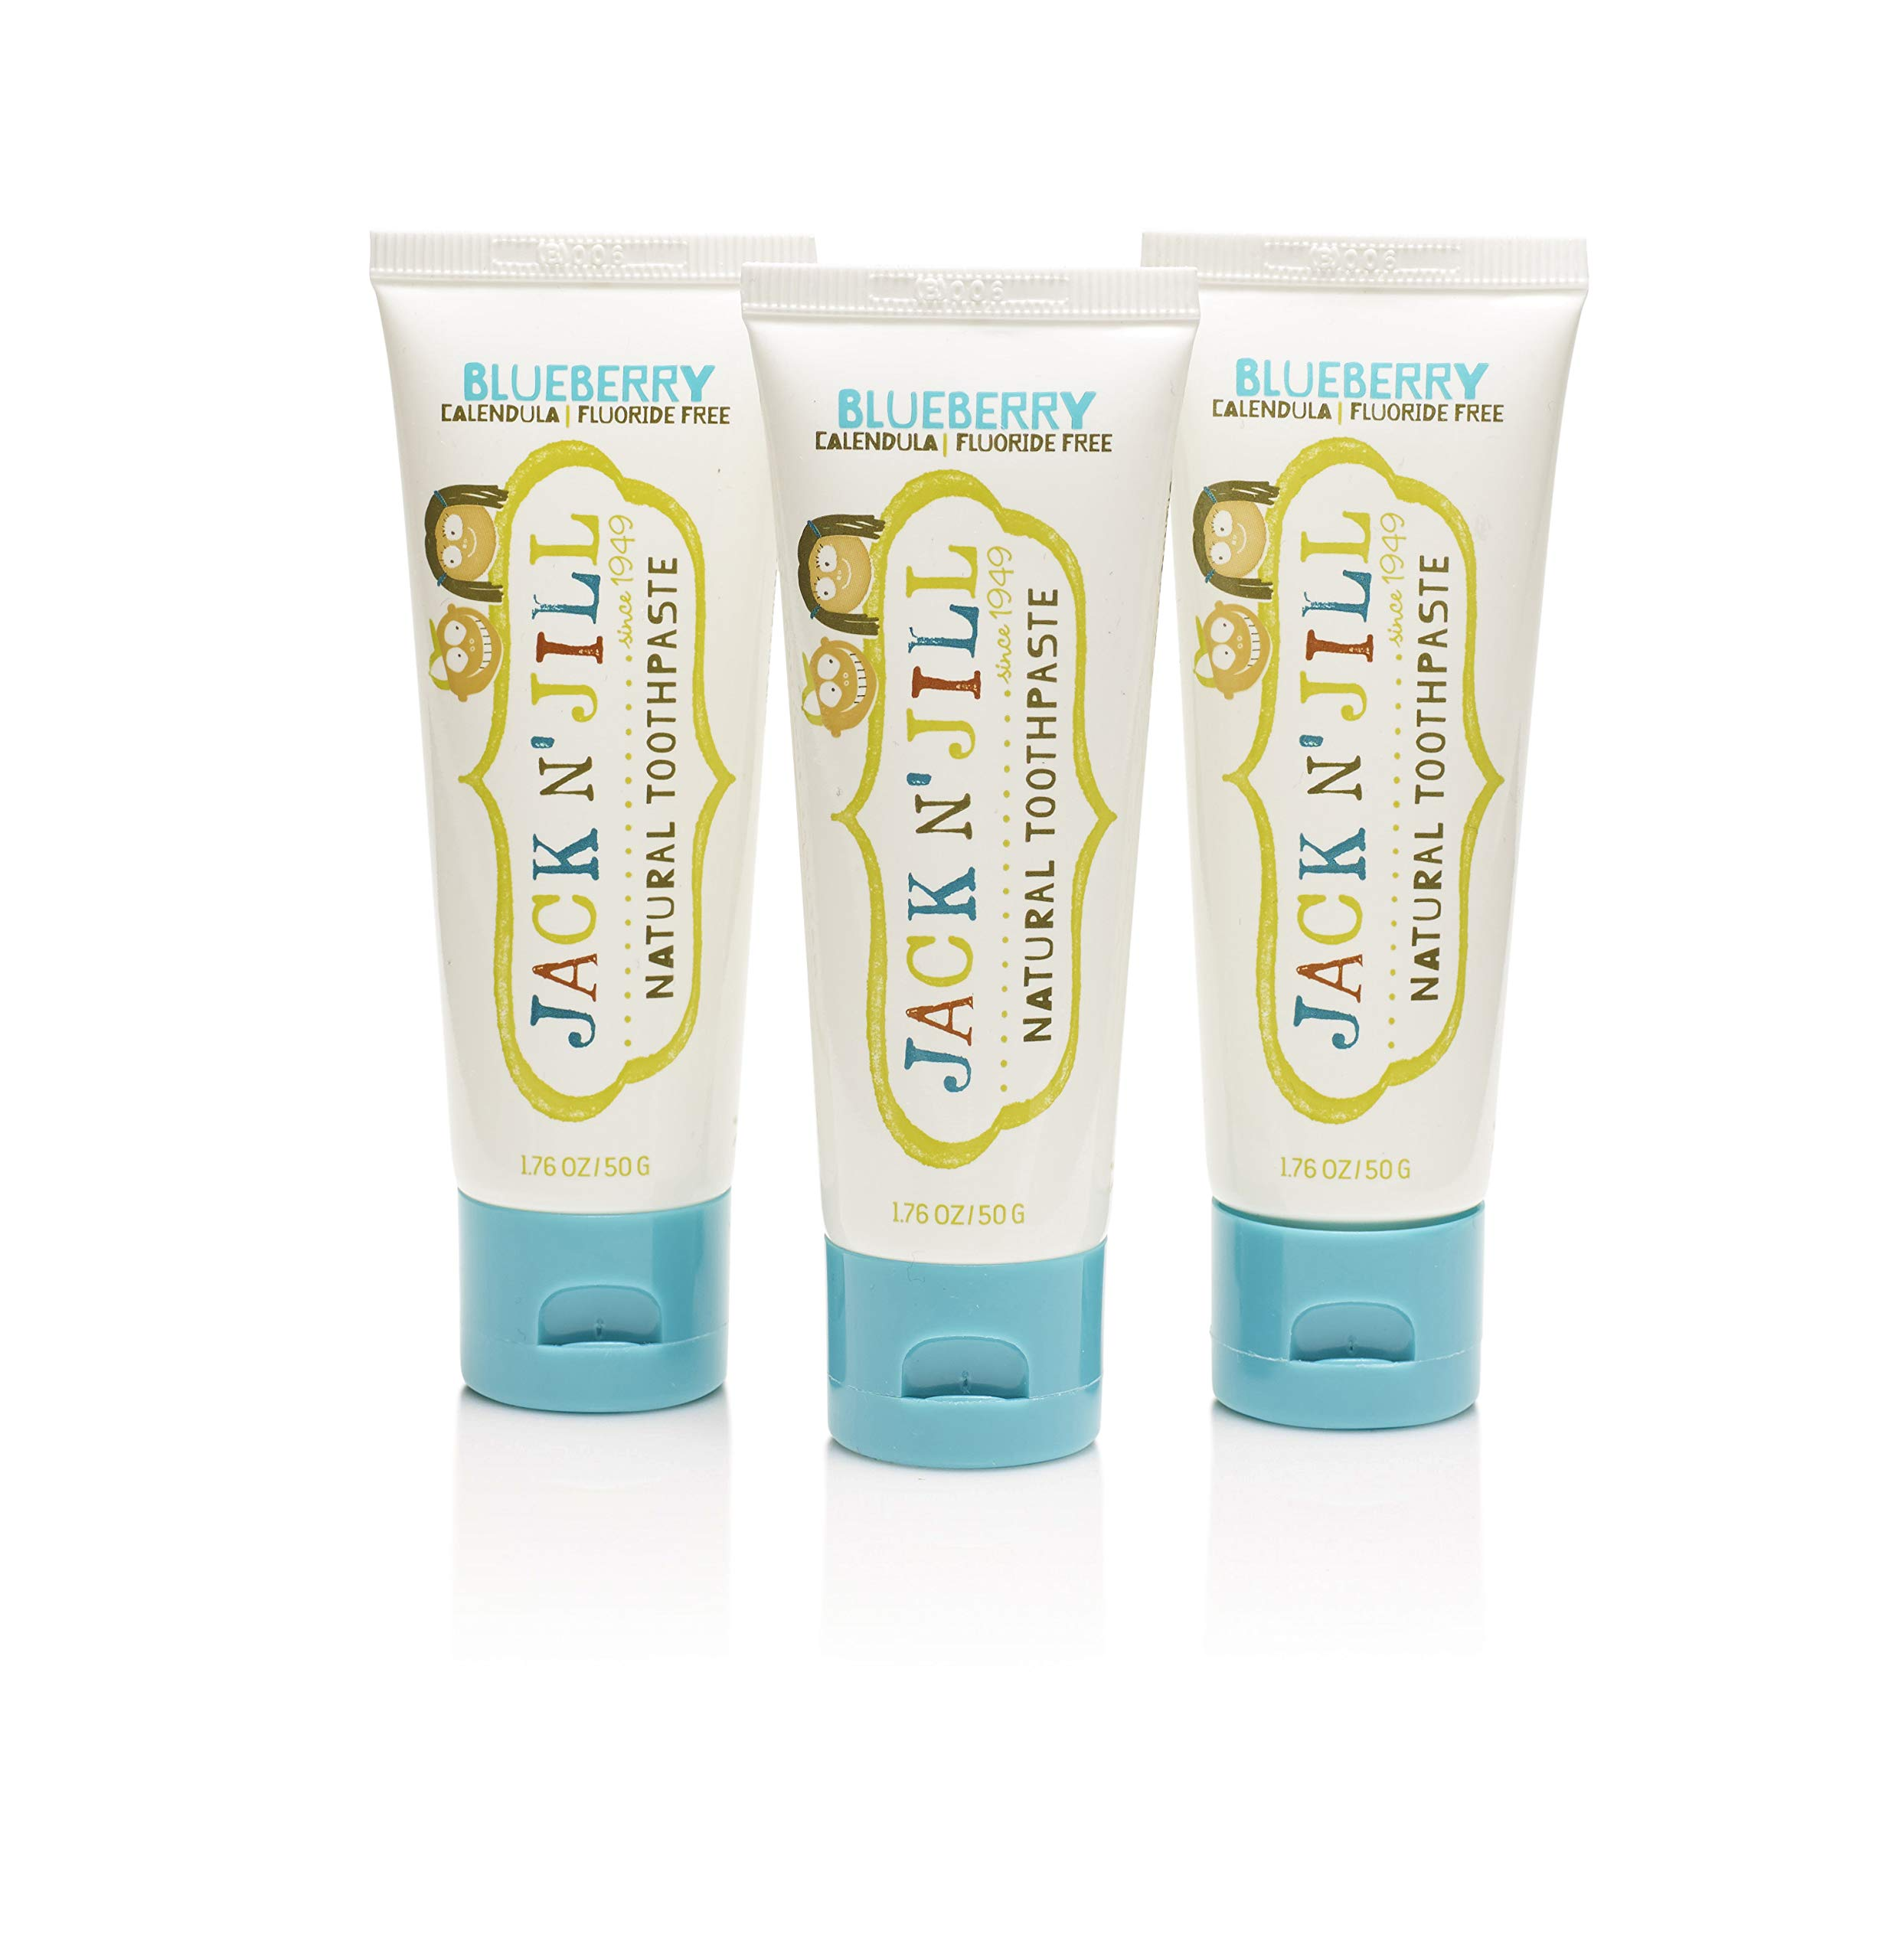 Jack N' Jill Natural Children's Toothpaste, Organic Blueberry, Fluoride Free, SLS Free, Vegan, 3-Pack